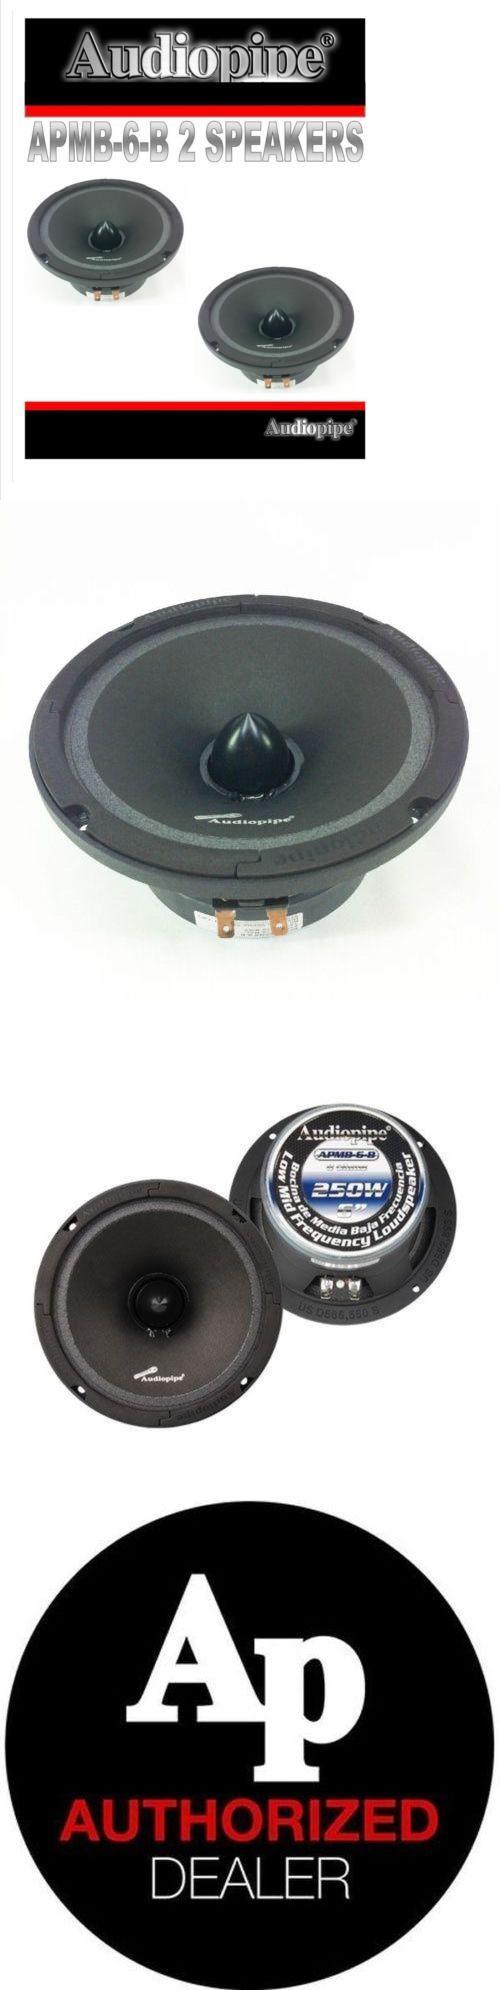 Car Speakers and Speaker Systems: (2) Audiopipe Apmb-6-B Pair Full Range Car Audio Loud Speakers Mids Car Stereo -> BUY IT NOW ONLY: $73.93 on eBay!